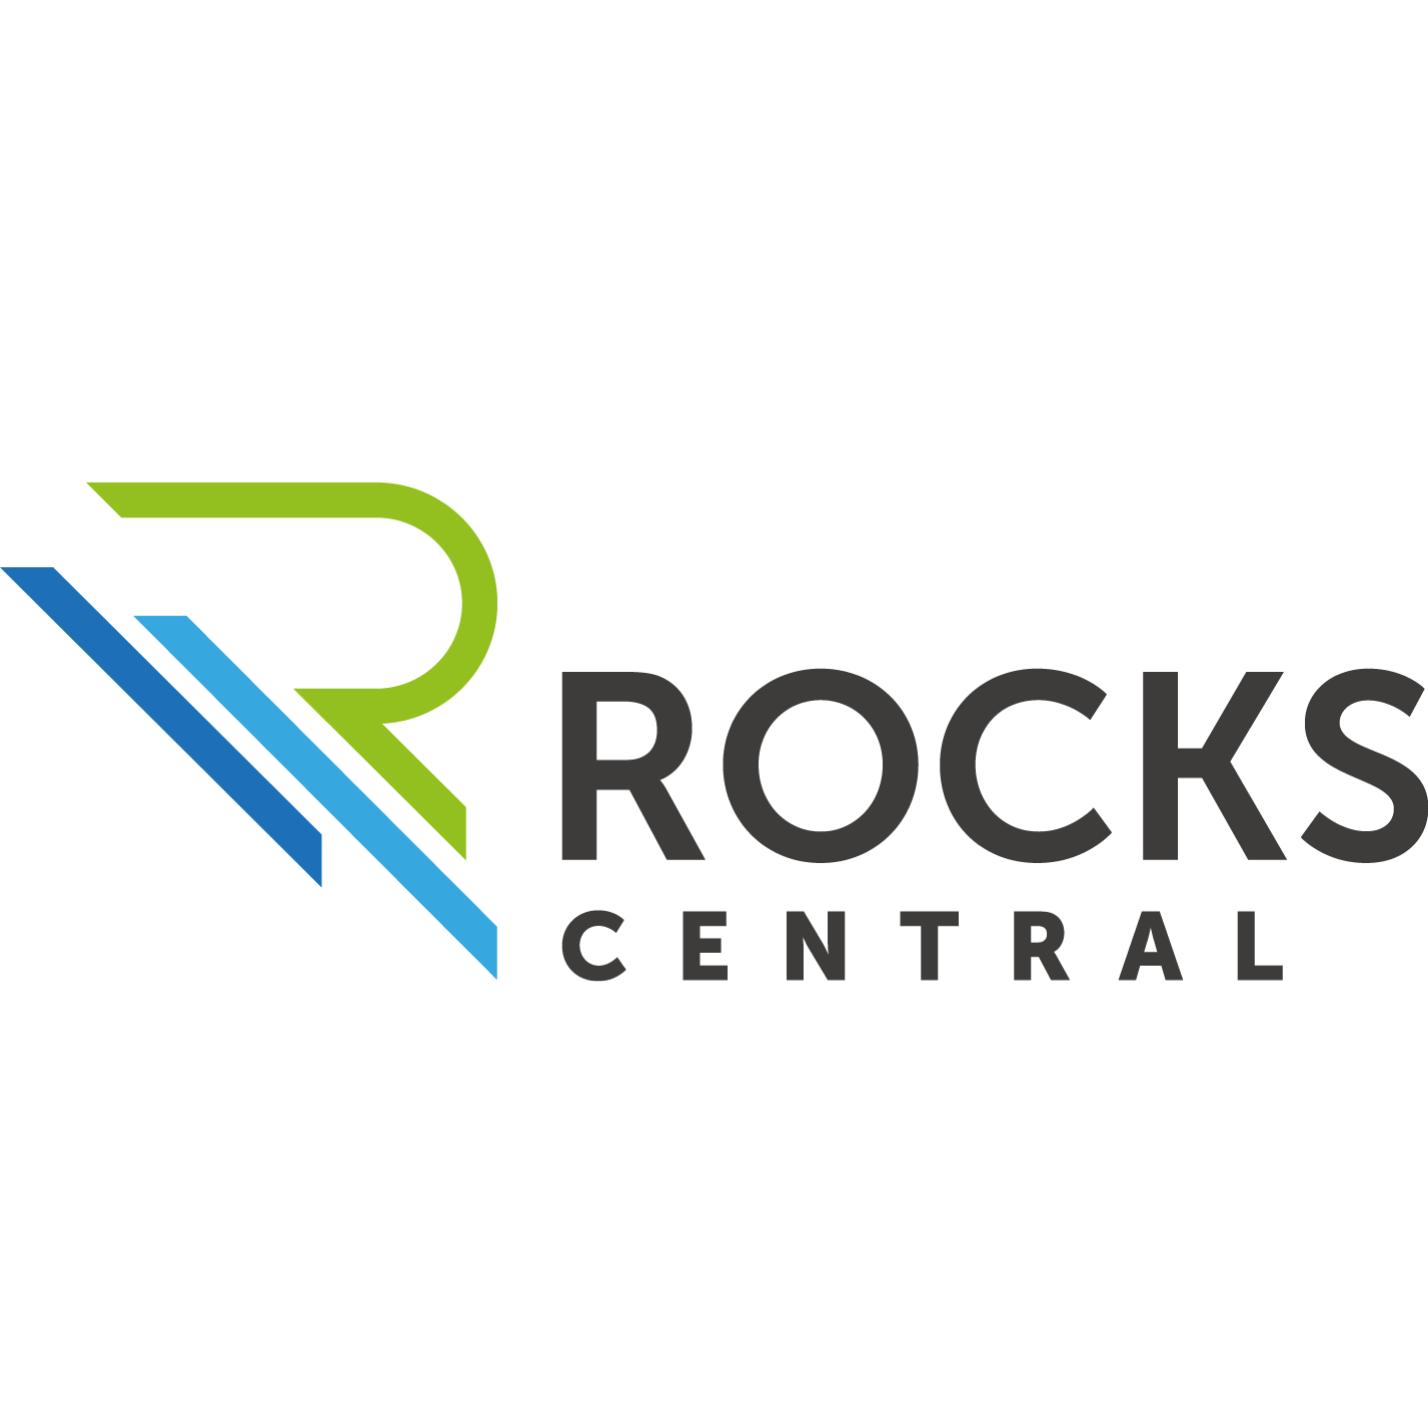 Rocks_Central_logo_1428sq.png